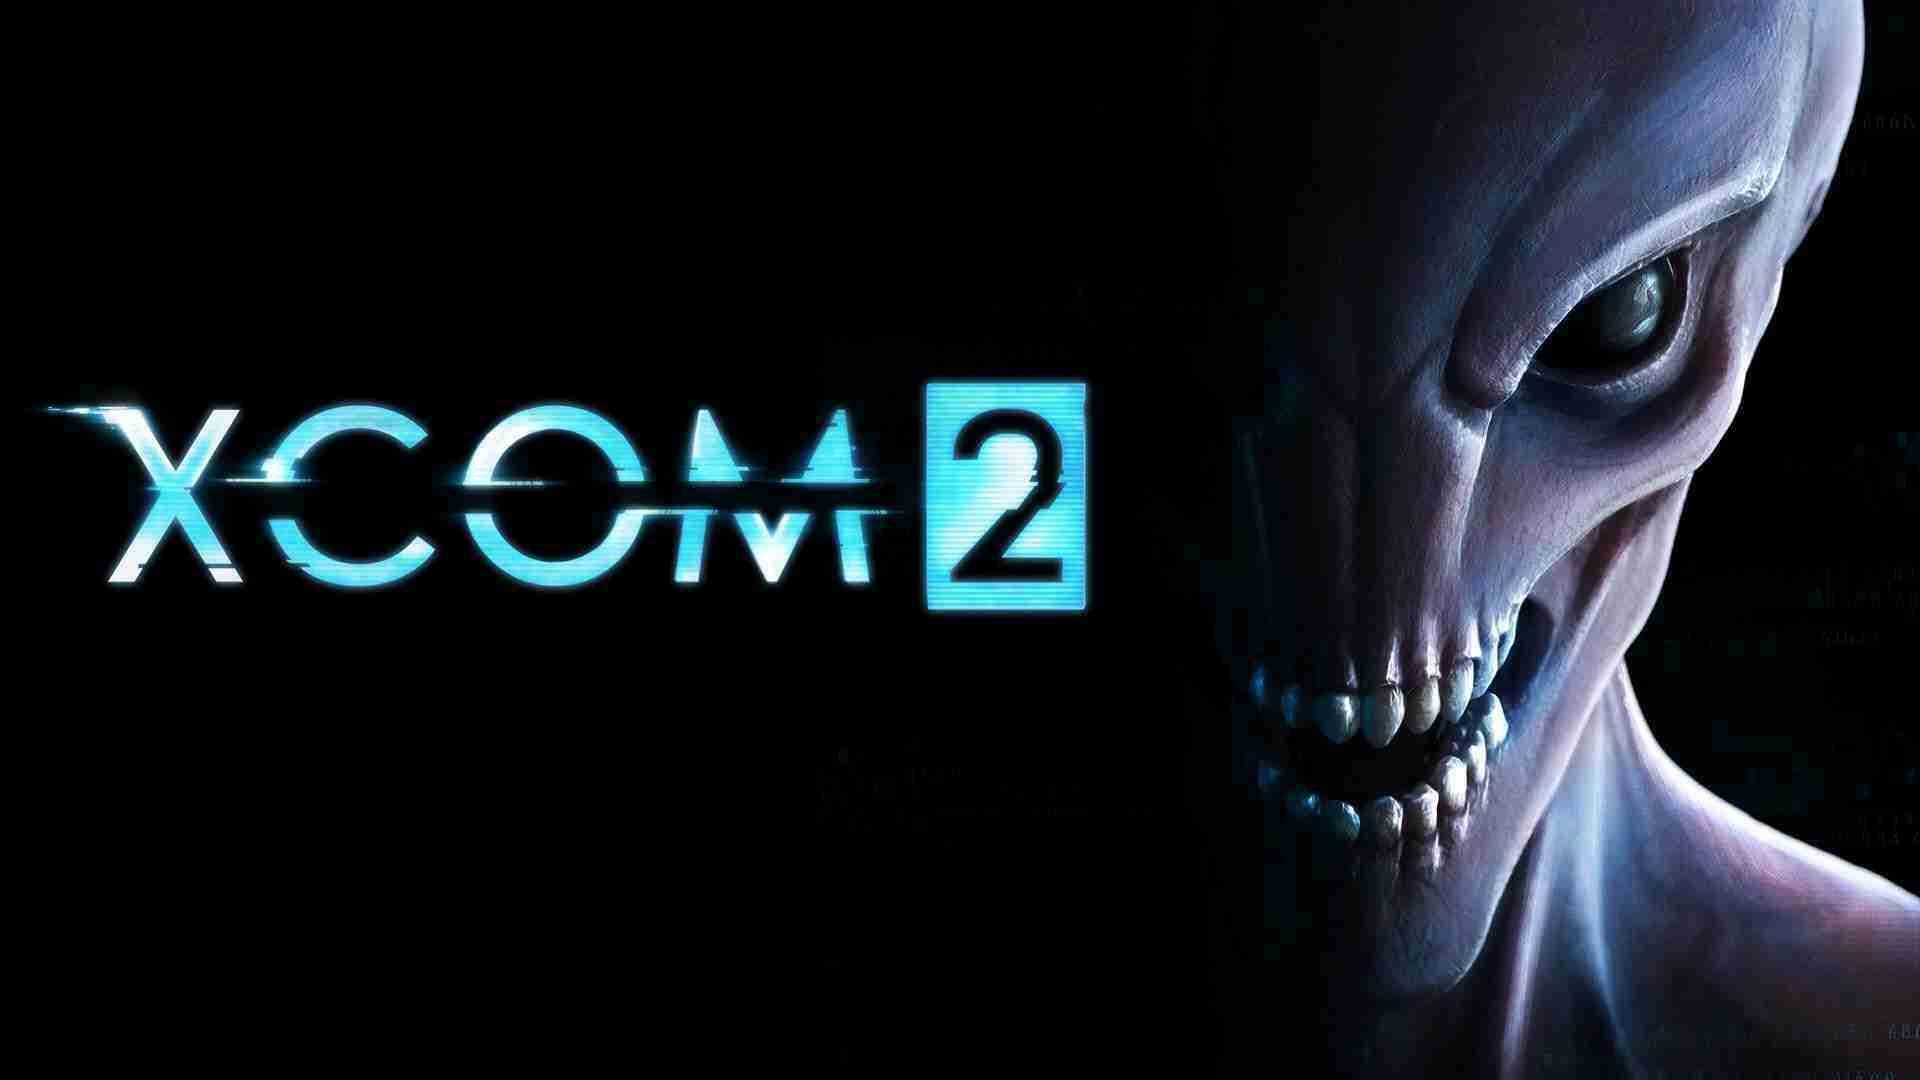 XCOM 2 günstig kaufen bei CDKeys.com!   Preisvergleich ...